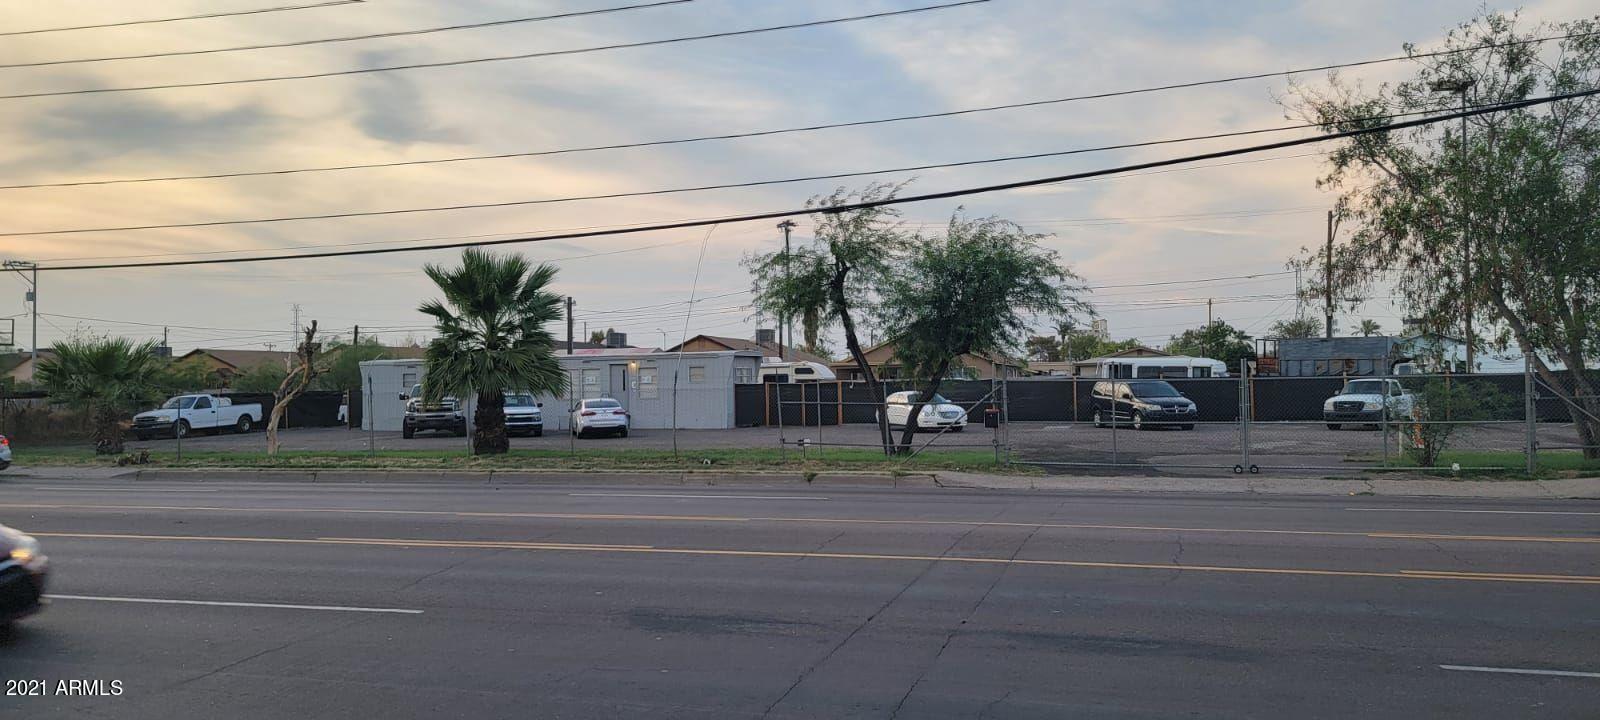 Photo of 2412 W BUCKEYE Road, Phoenix, AZ 85009 (MLS # 6269337)